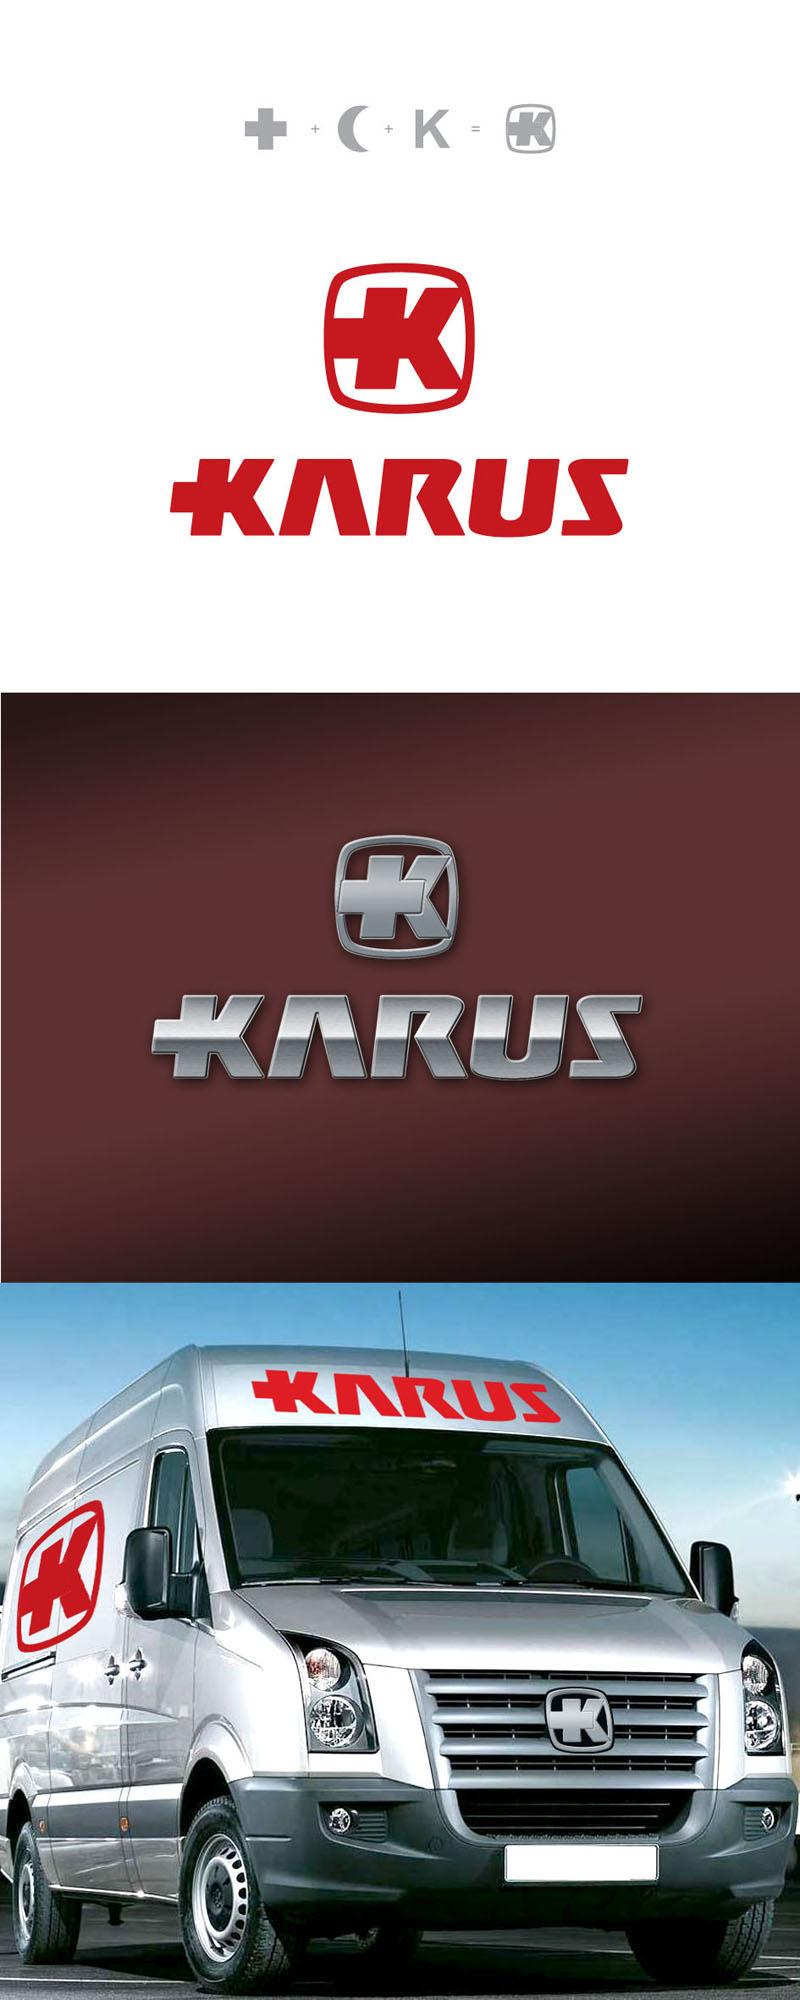 Разработка логотипа, фирменных цветов и фирменного знака фото f_315533fd9f088363.jpg